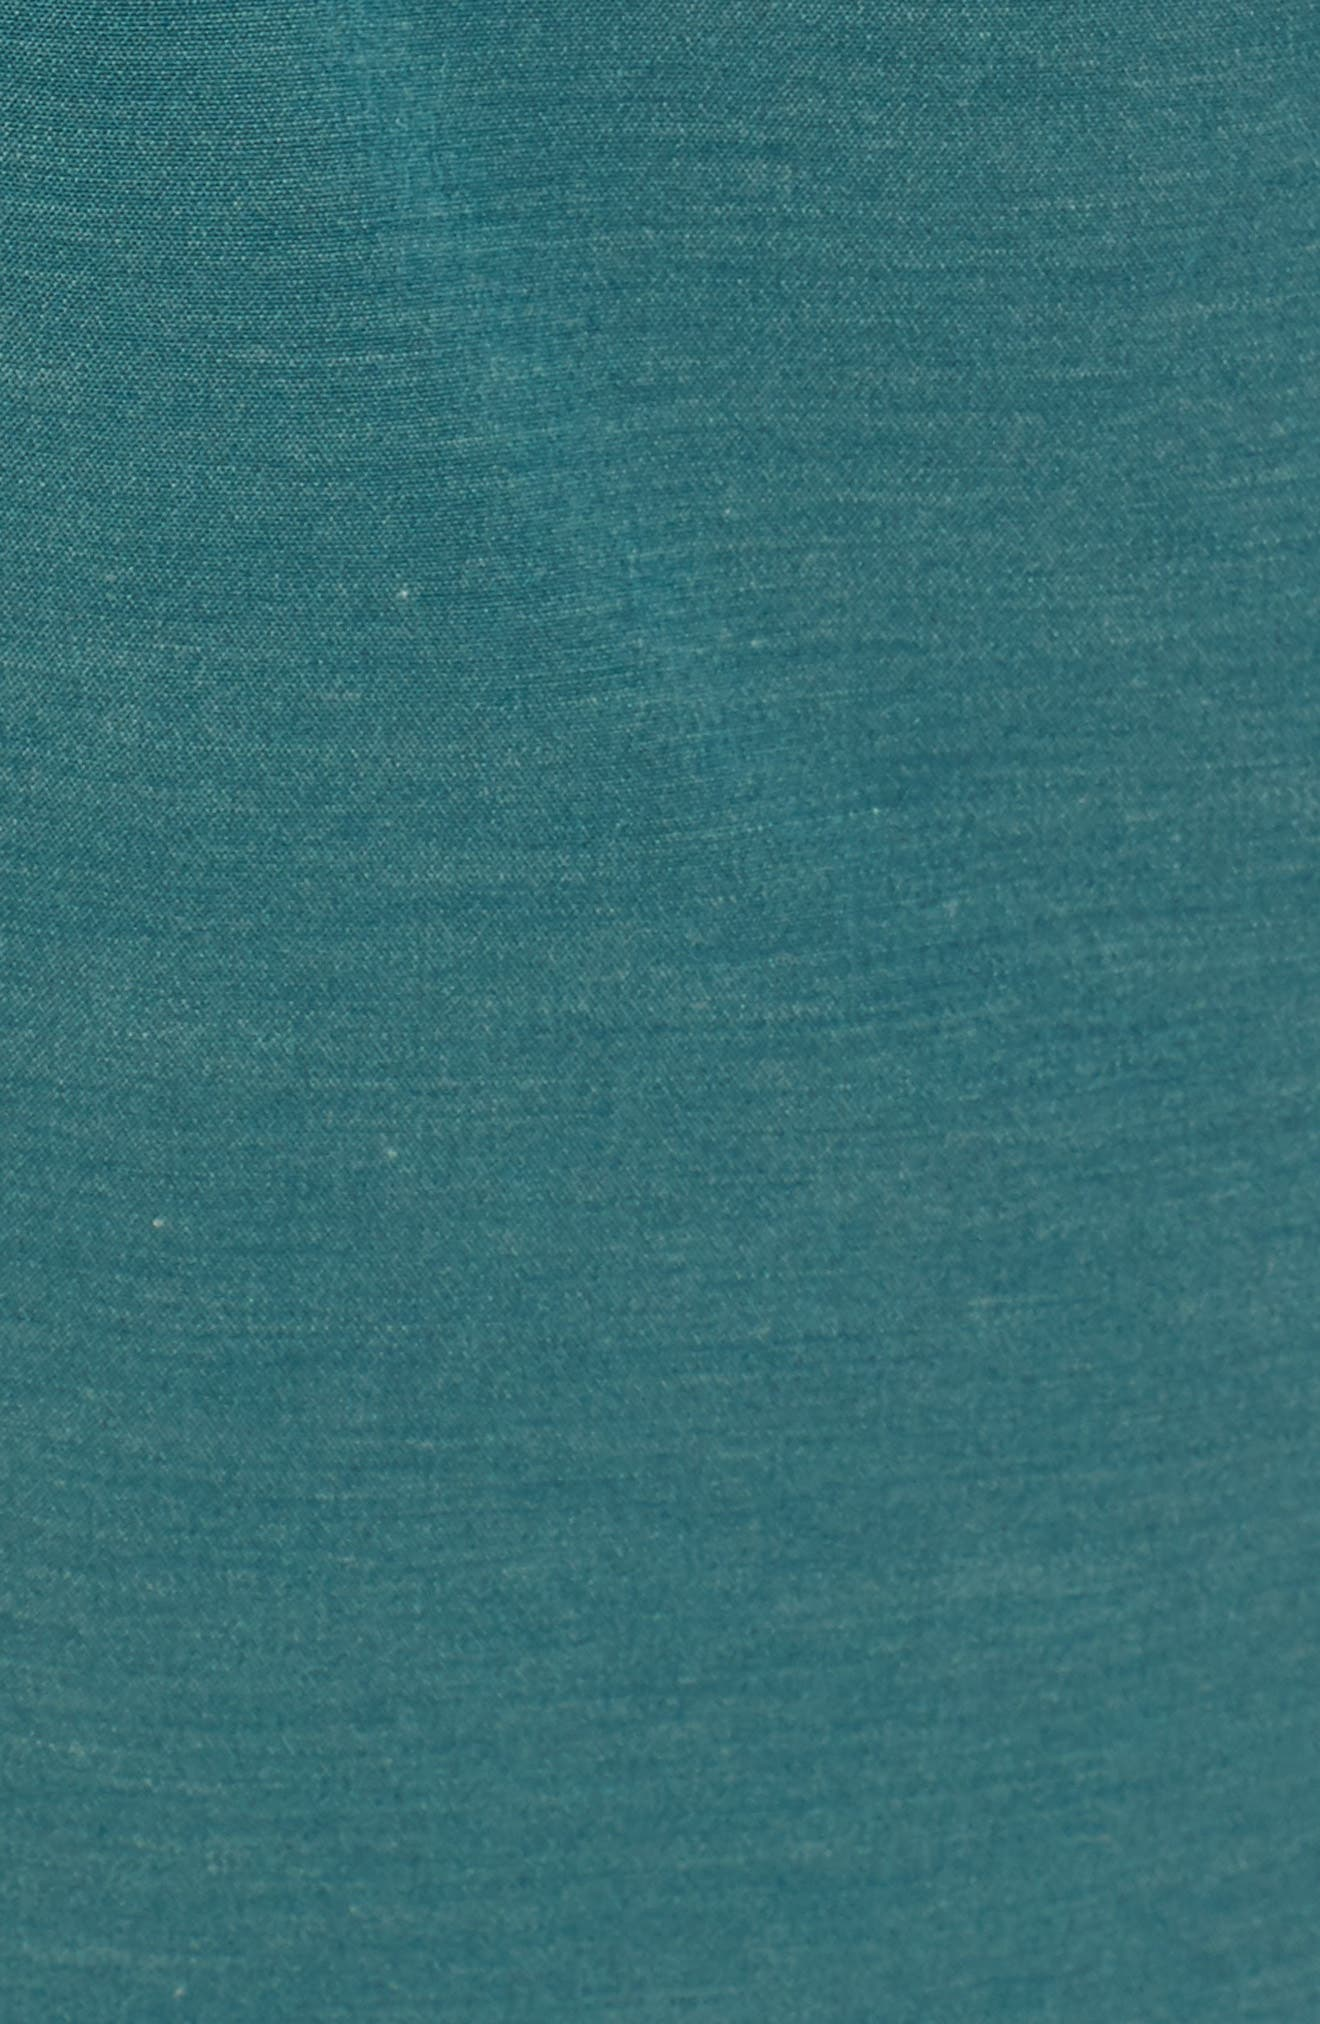 Metric Board Shorts,                             Alternate thumbnail 5, color,                             300